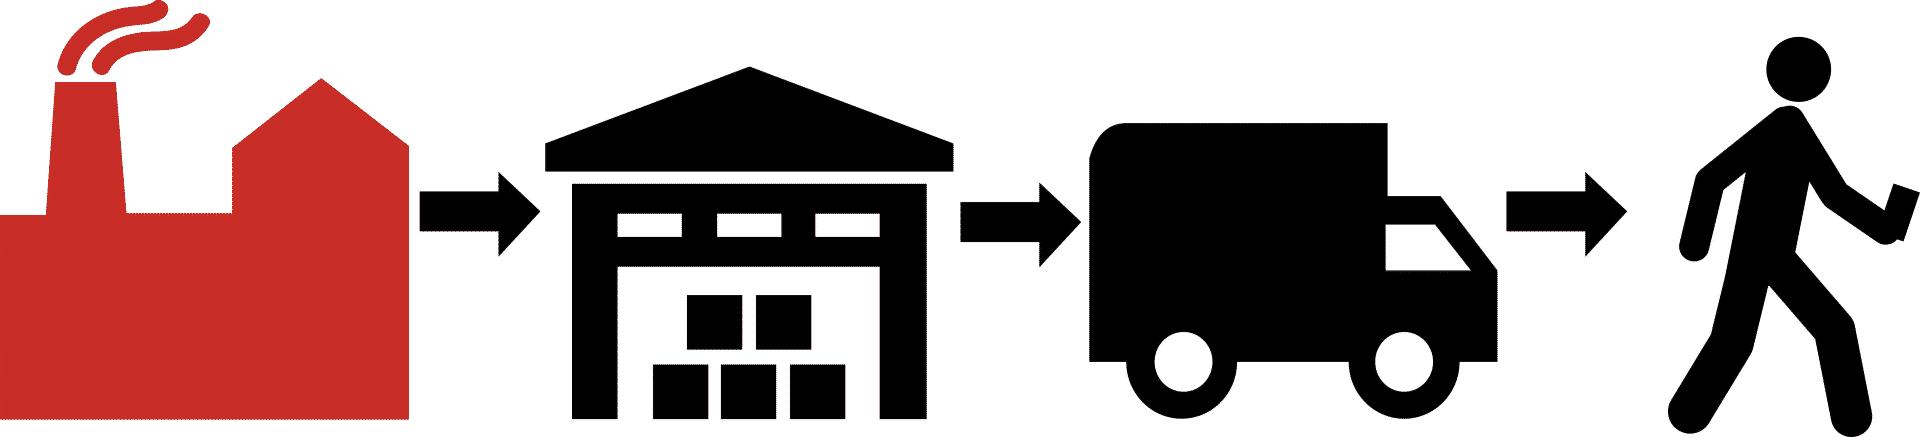 Solution Set - Manufacturing